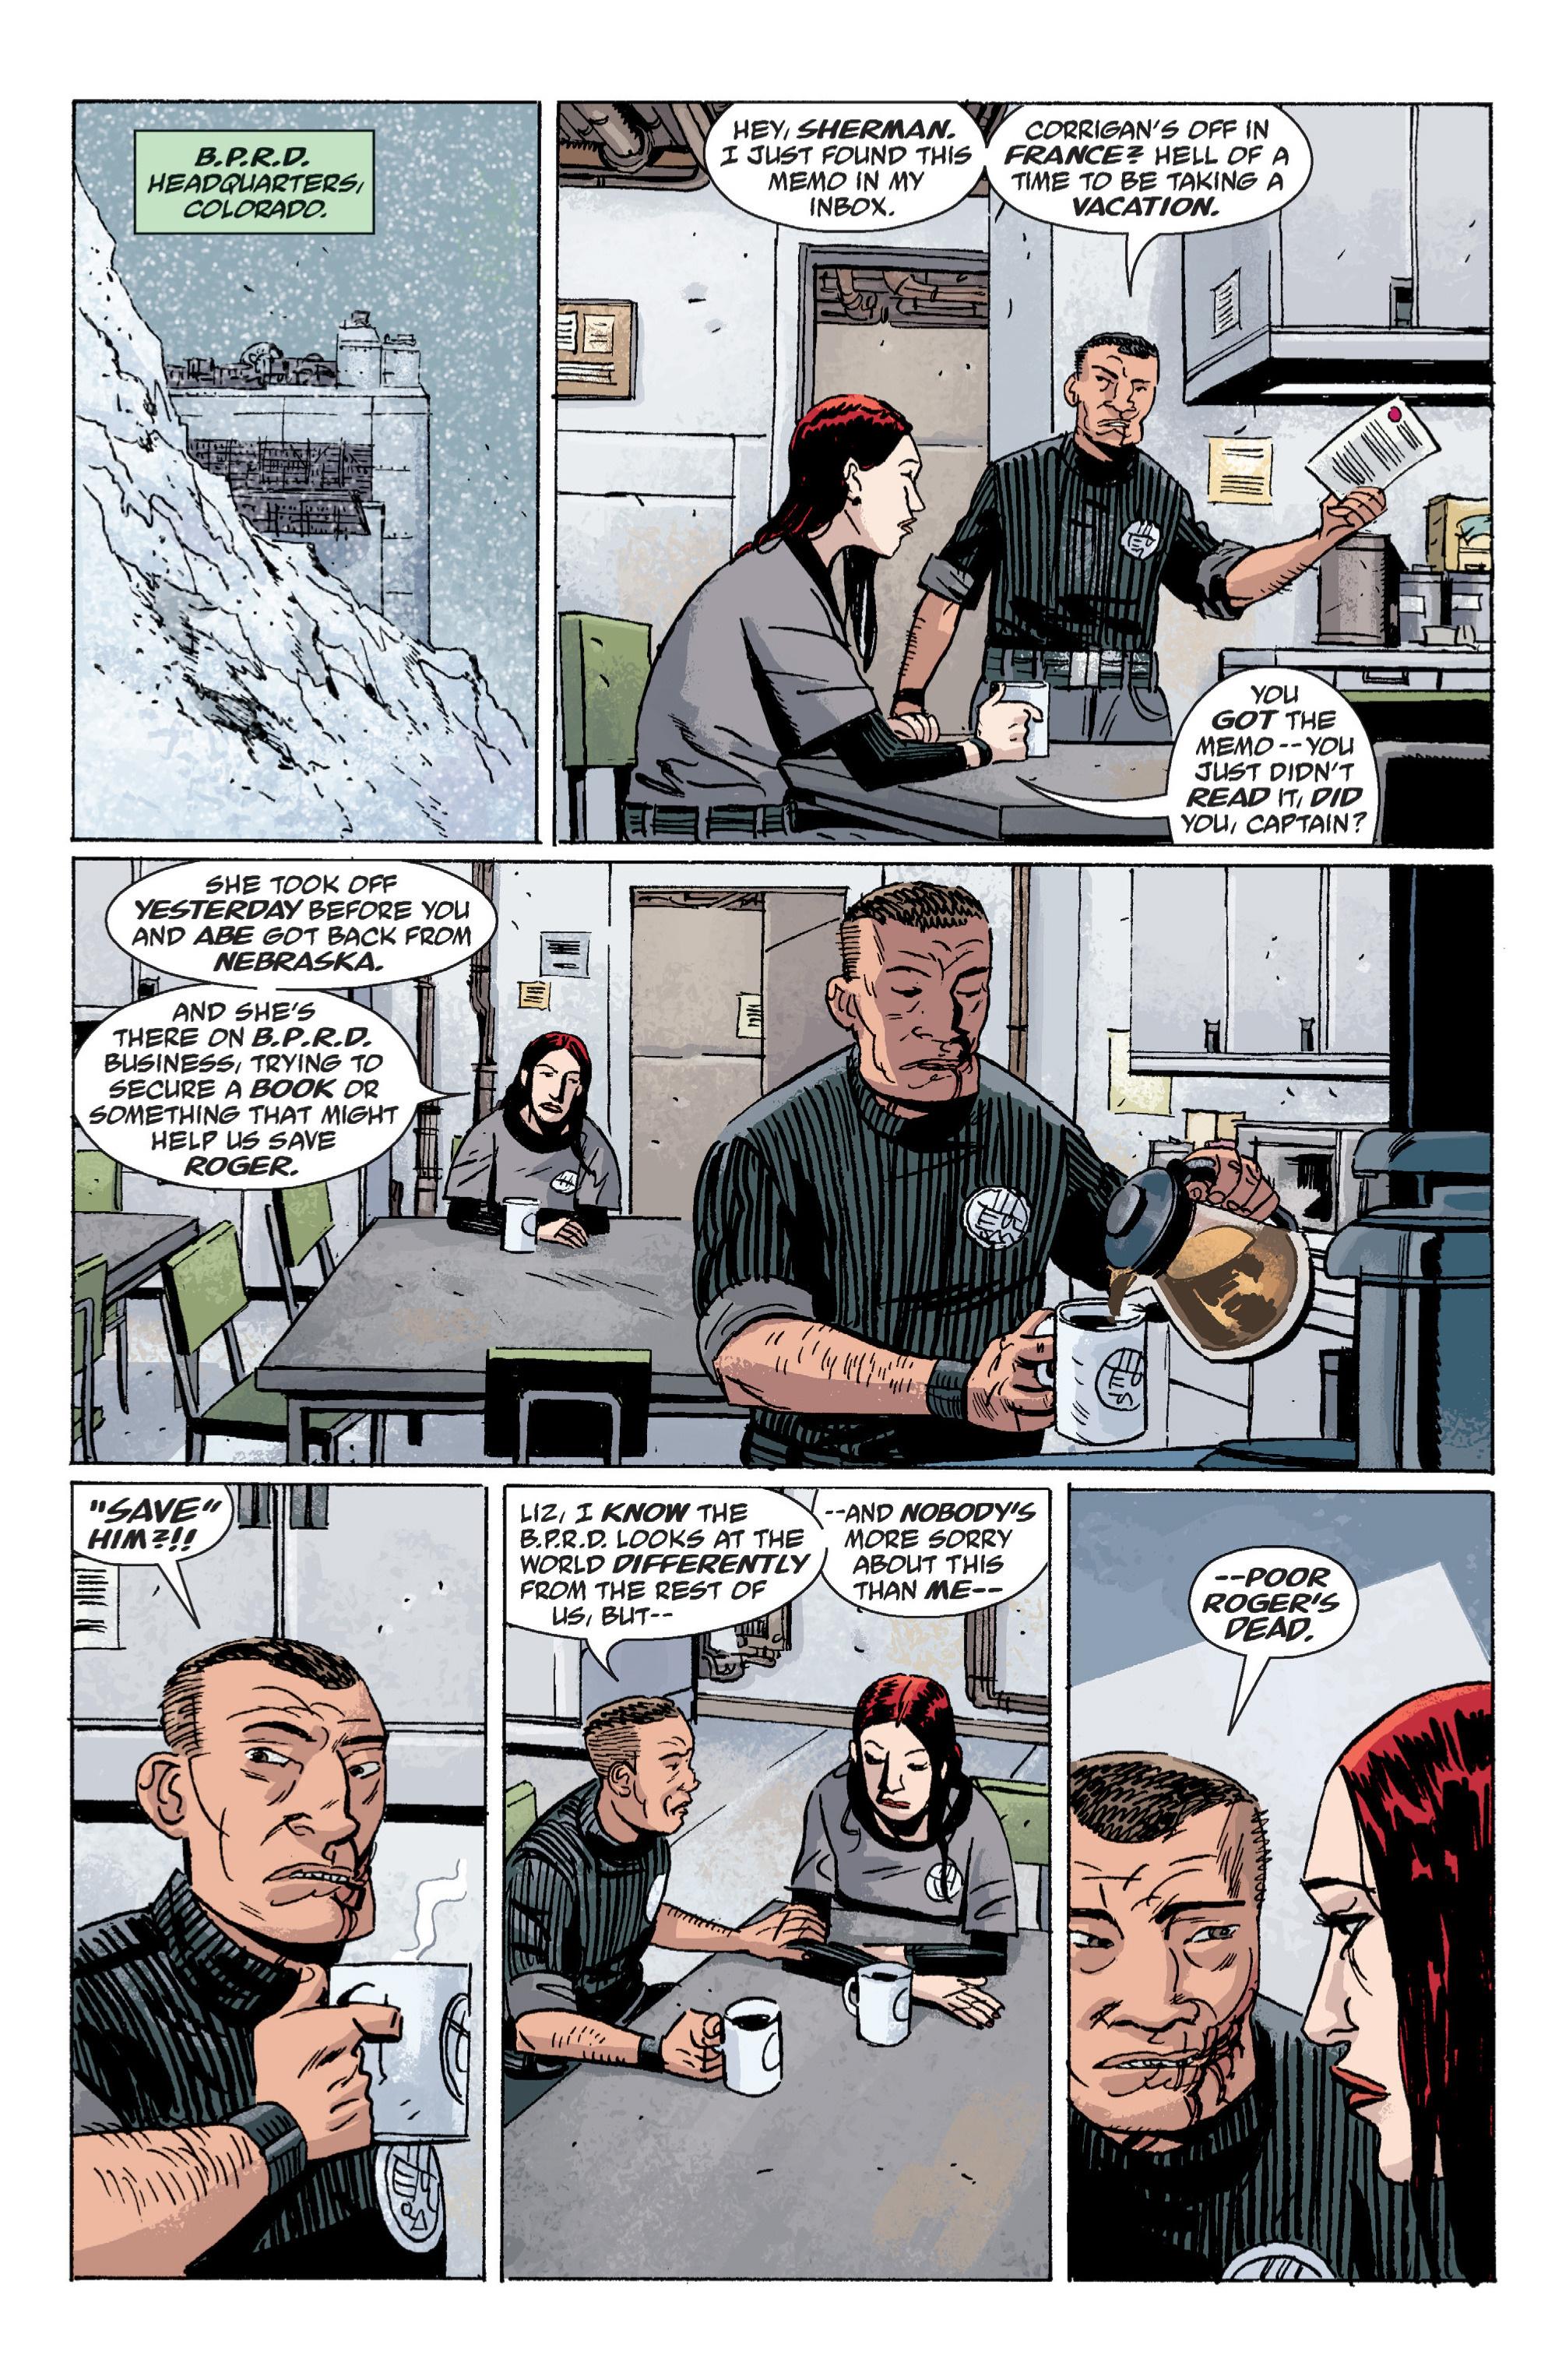 Read online B.P.R.D. (2003) comic -  Issue # TPB 6 - 17